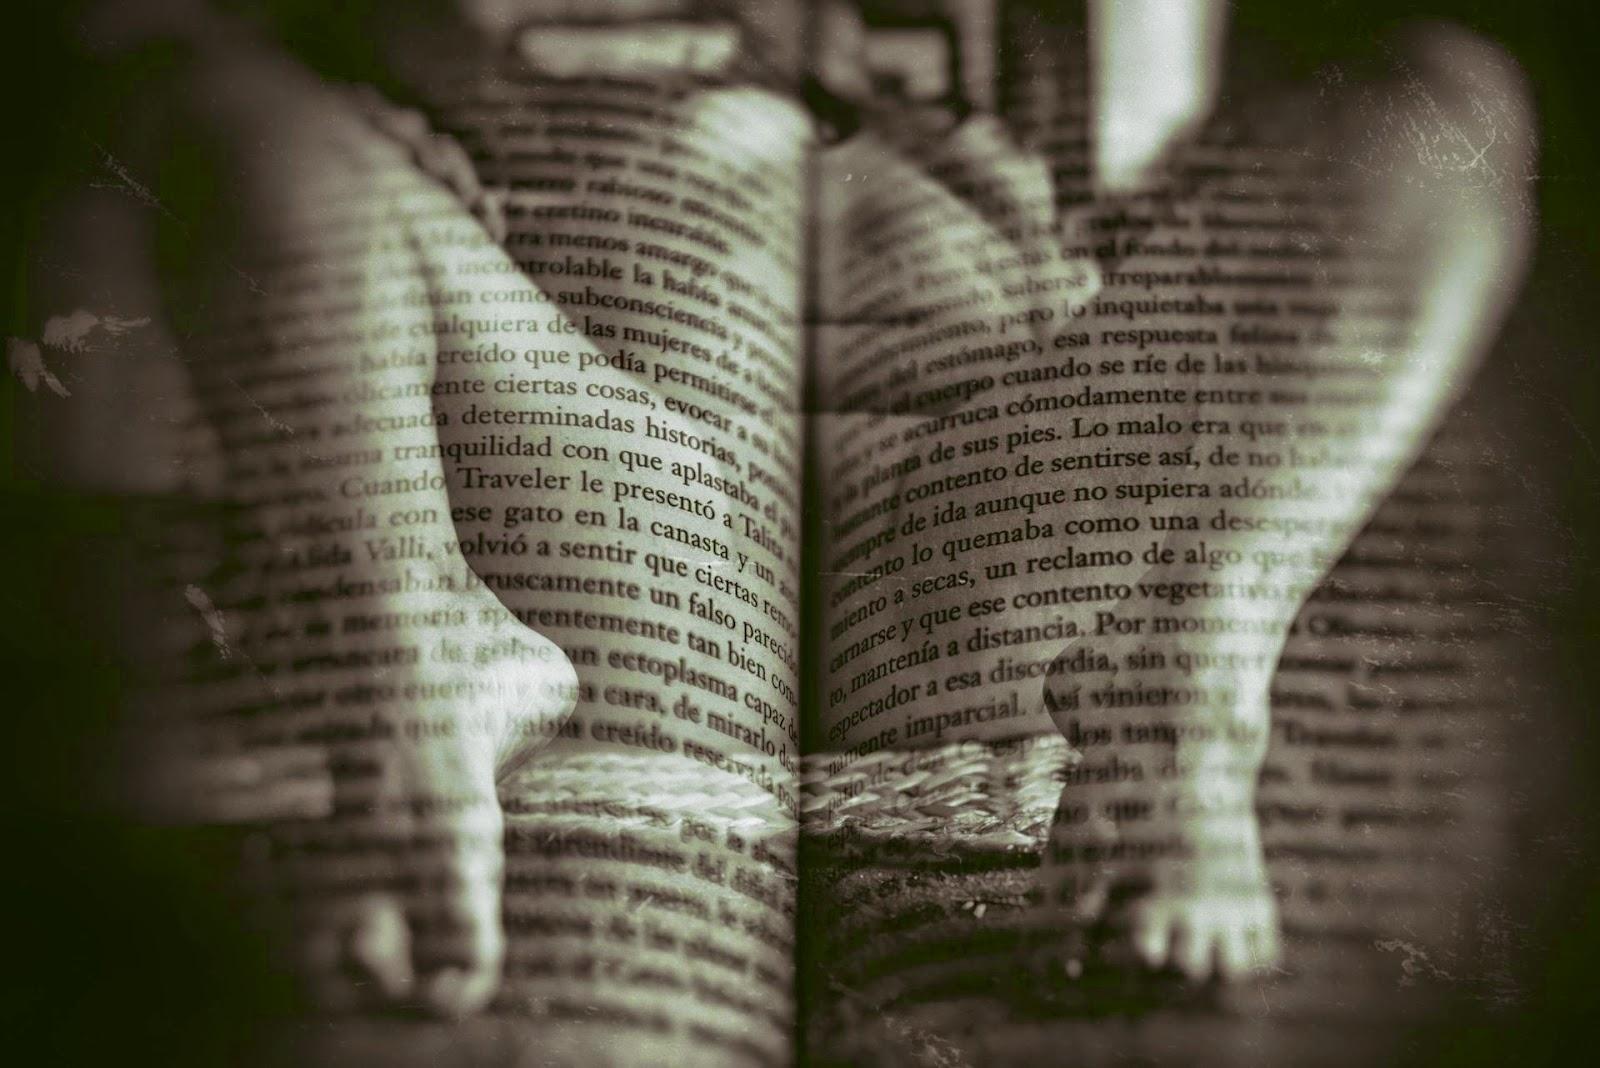 https://elbicnaranja.wordpress.com/2014/12/26/viernes-creativo-escribe-una-historia-84/comment-page-1/#comment-3358